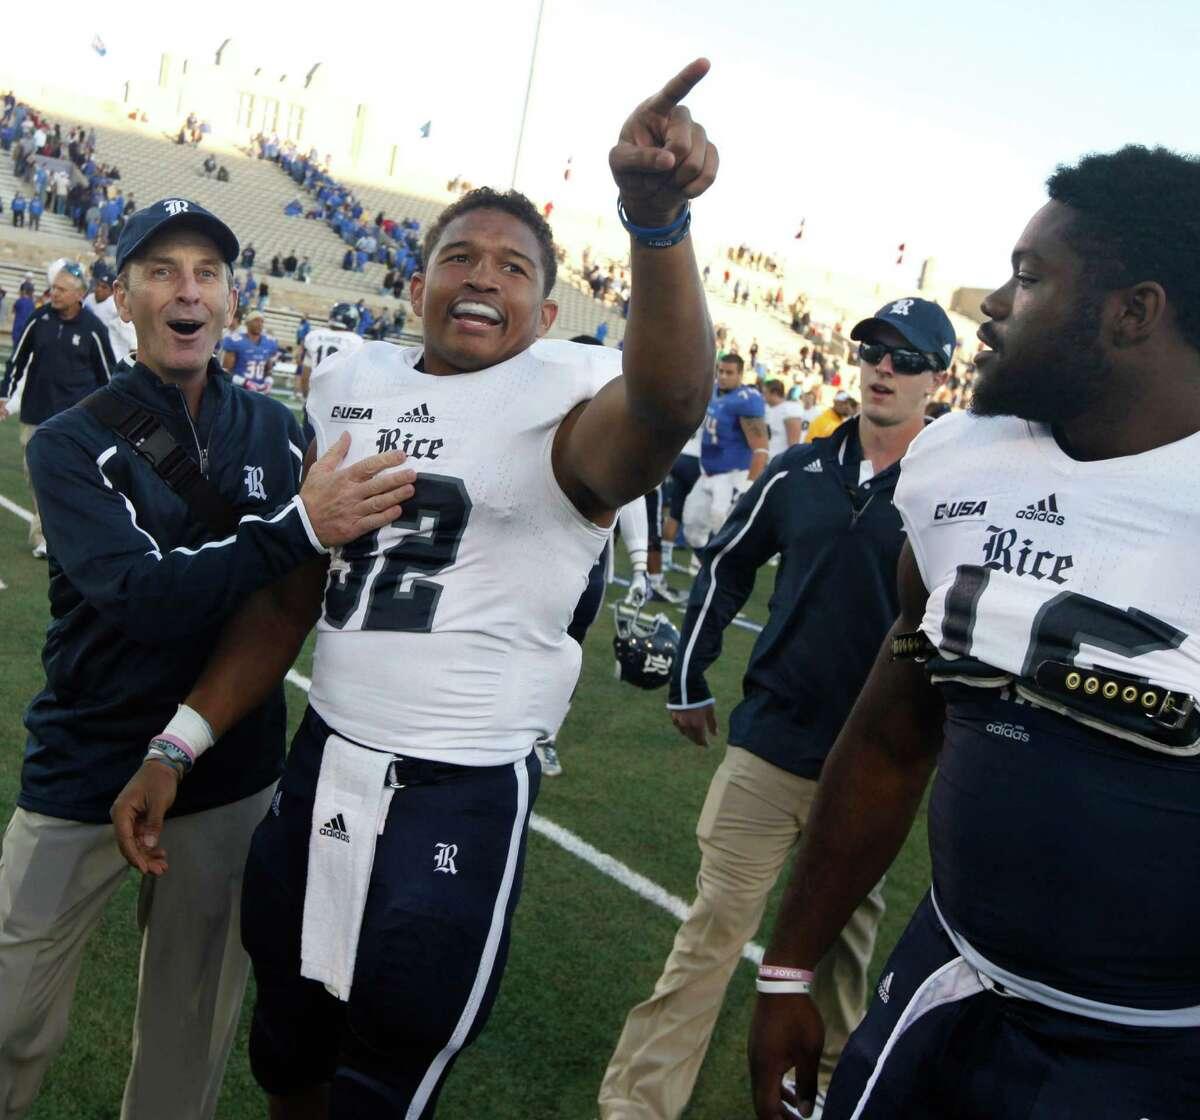 Rice's Darik Dillard, center, celebrates after he made the game winning touchdown during an overtime NCAA college football game against Tulsa, Oct. 5, 2013, at Chapman Stadium in Tulsa, Okla. (AP Photo/Tulsa World, Tom Gilbert)